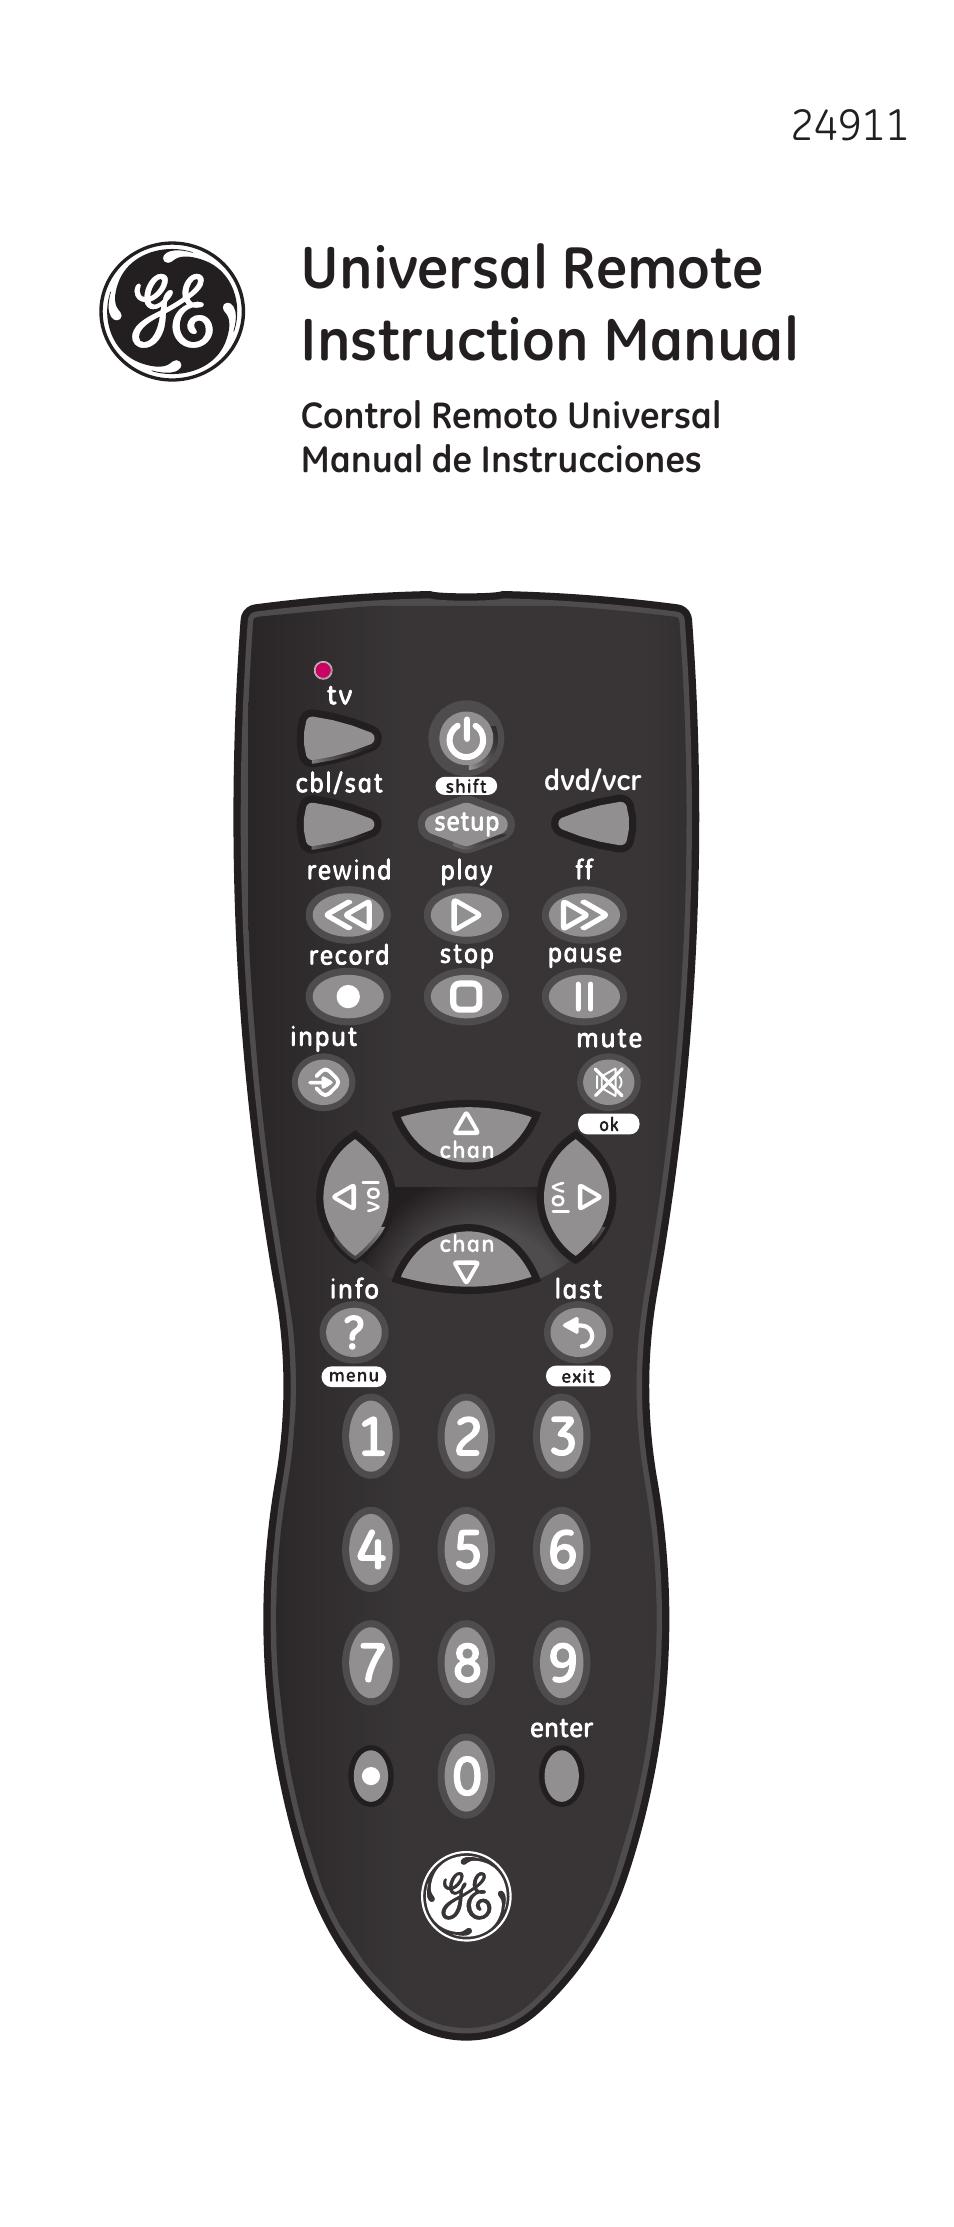 GE 24911 V2 GE Universal Remote User Manual 44 Pages